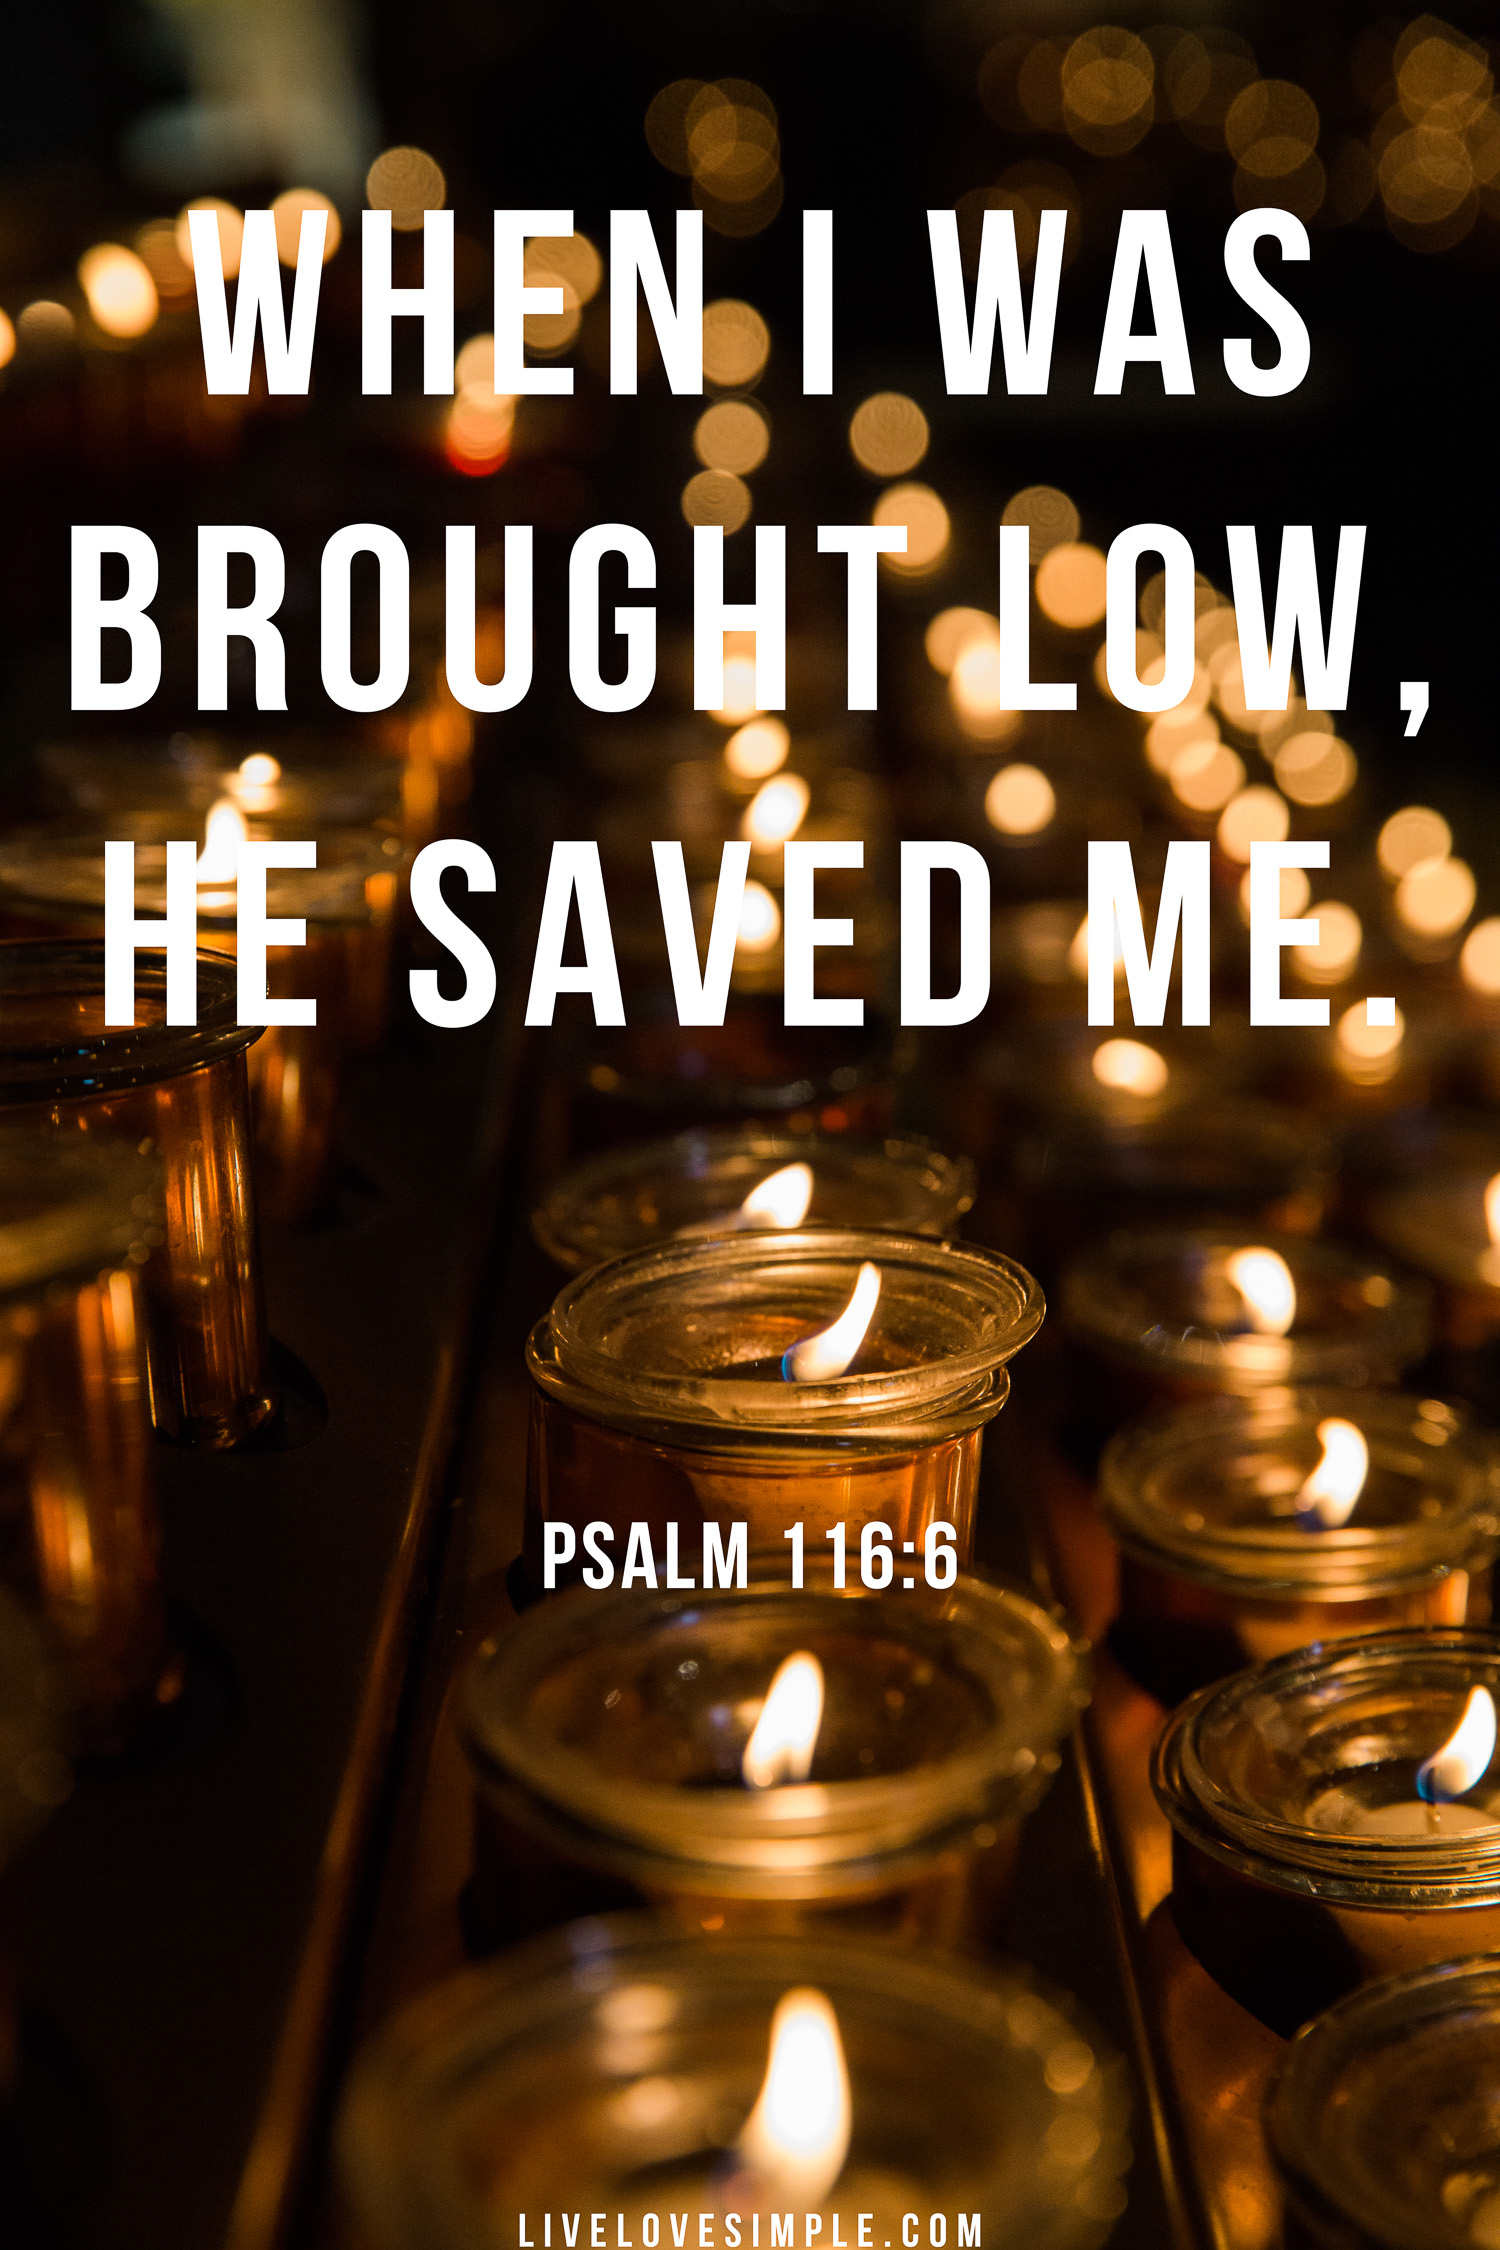 He saved me.